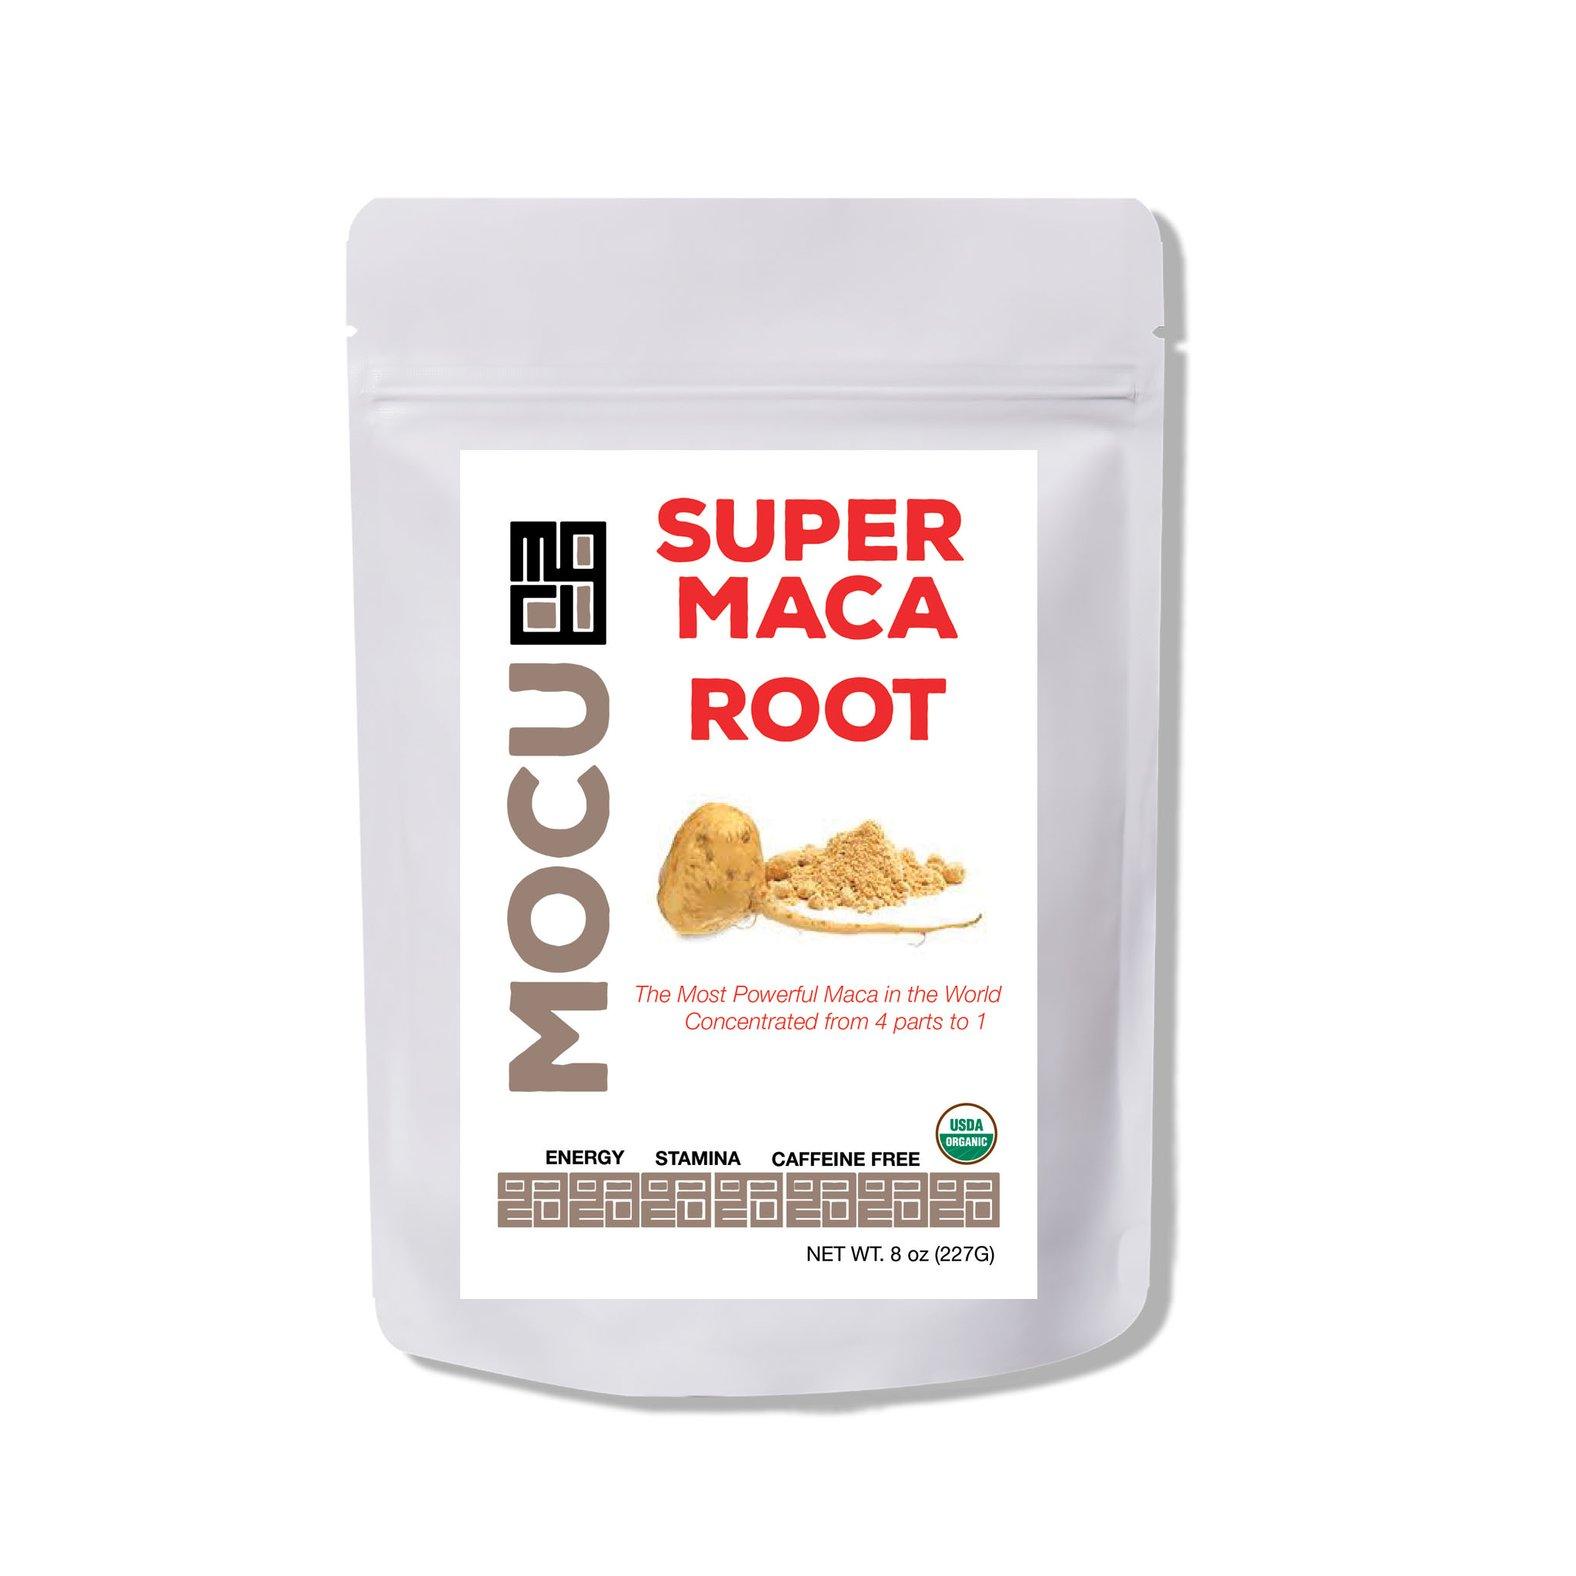 mocu-super-maca-root-organic-front.jpg